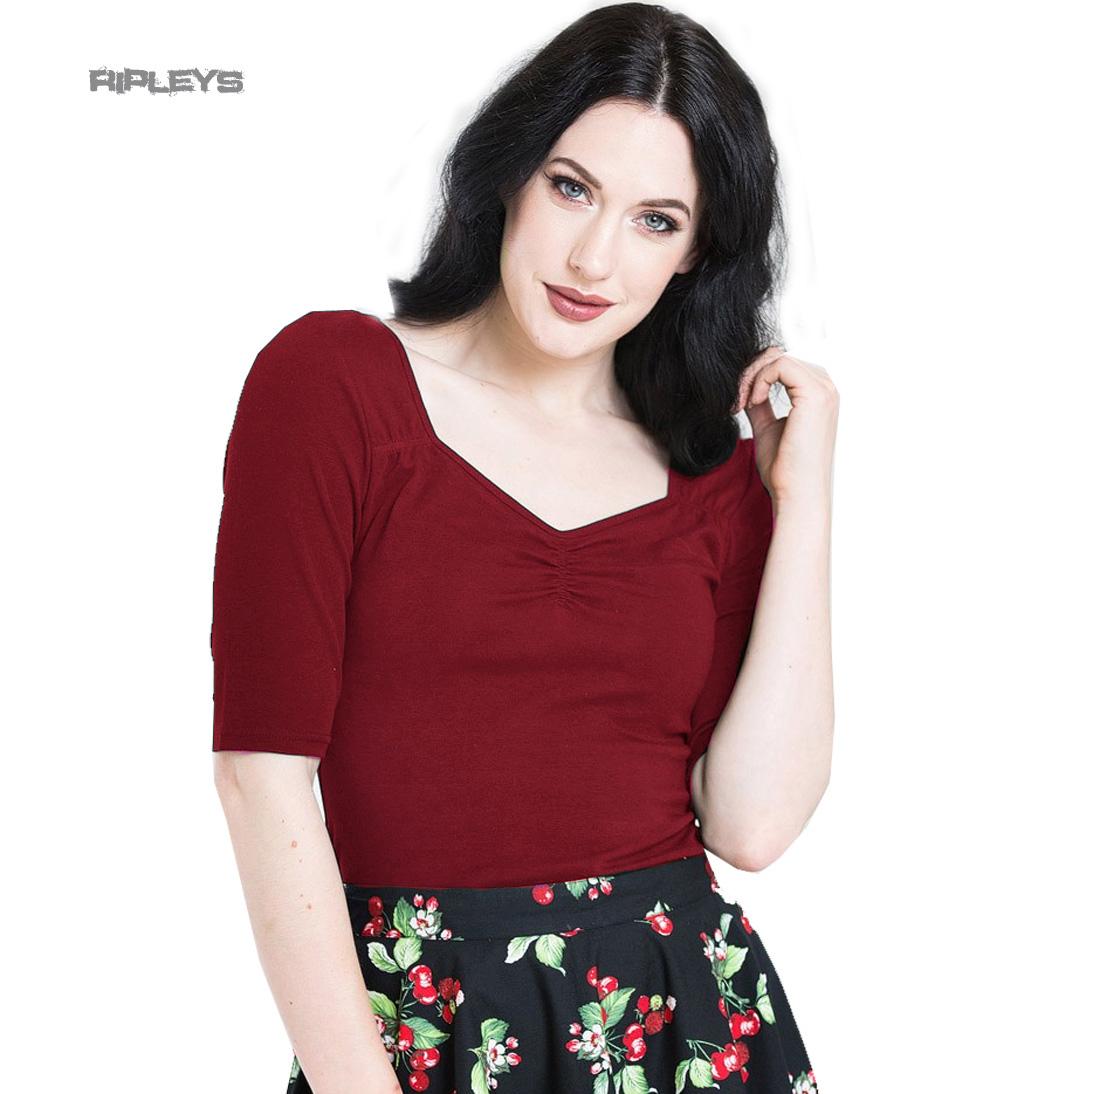 Hell Bunny Shirt 50s Rockabilly Top MIA Plain Black Short Sleeves All Sizes